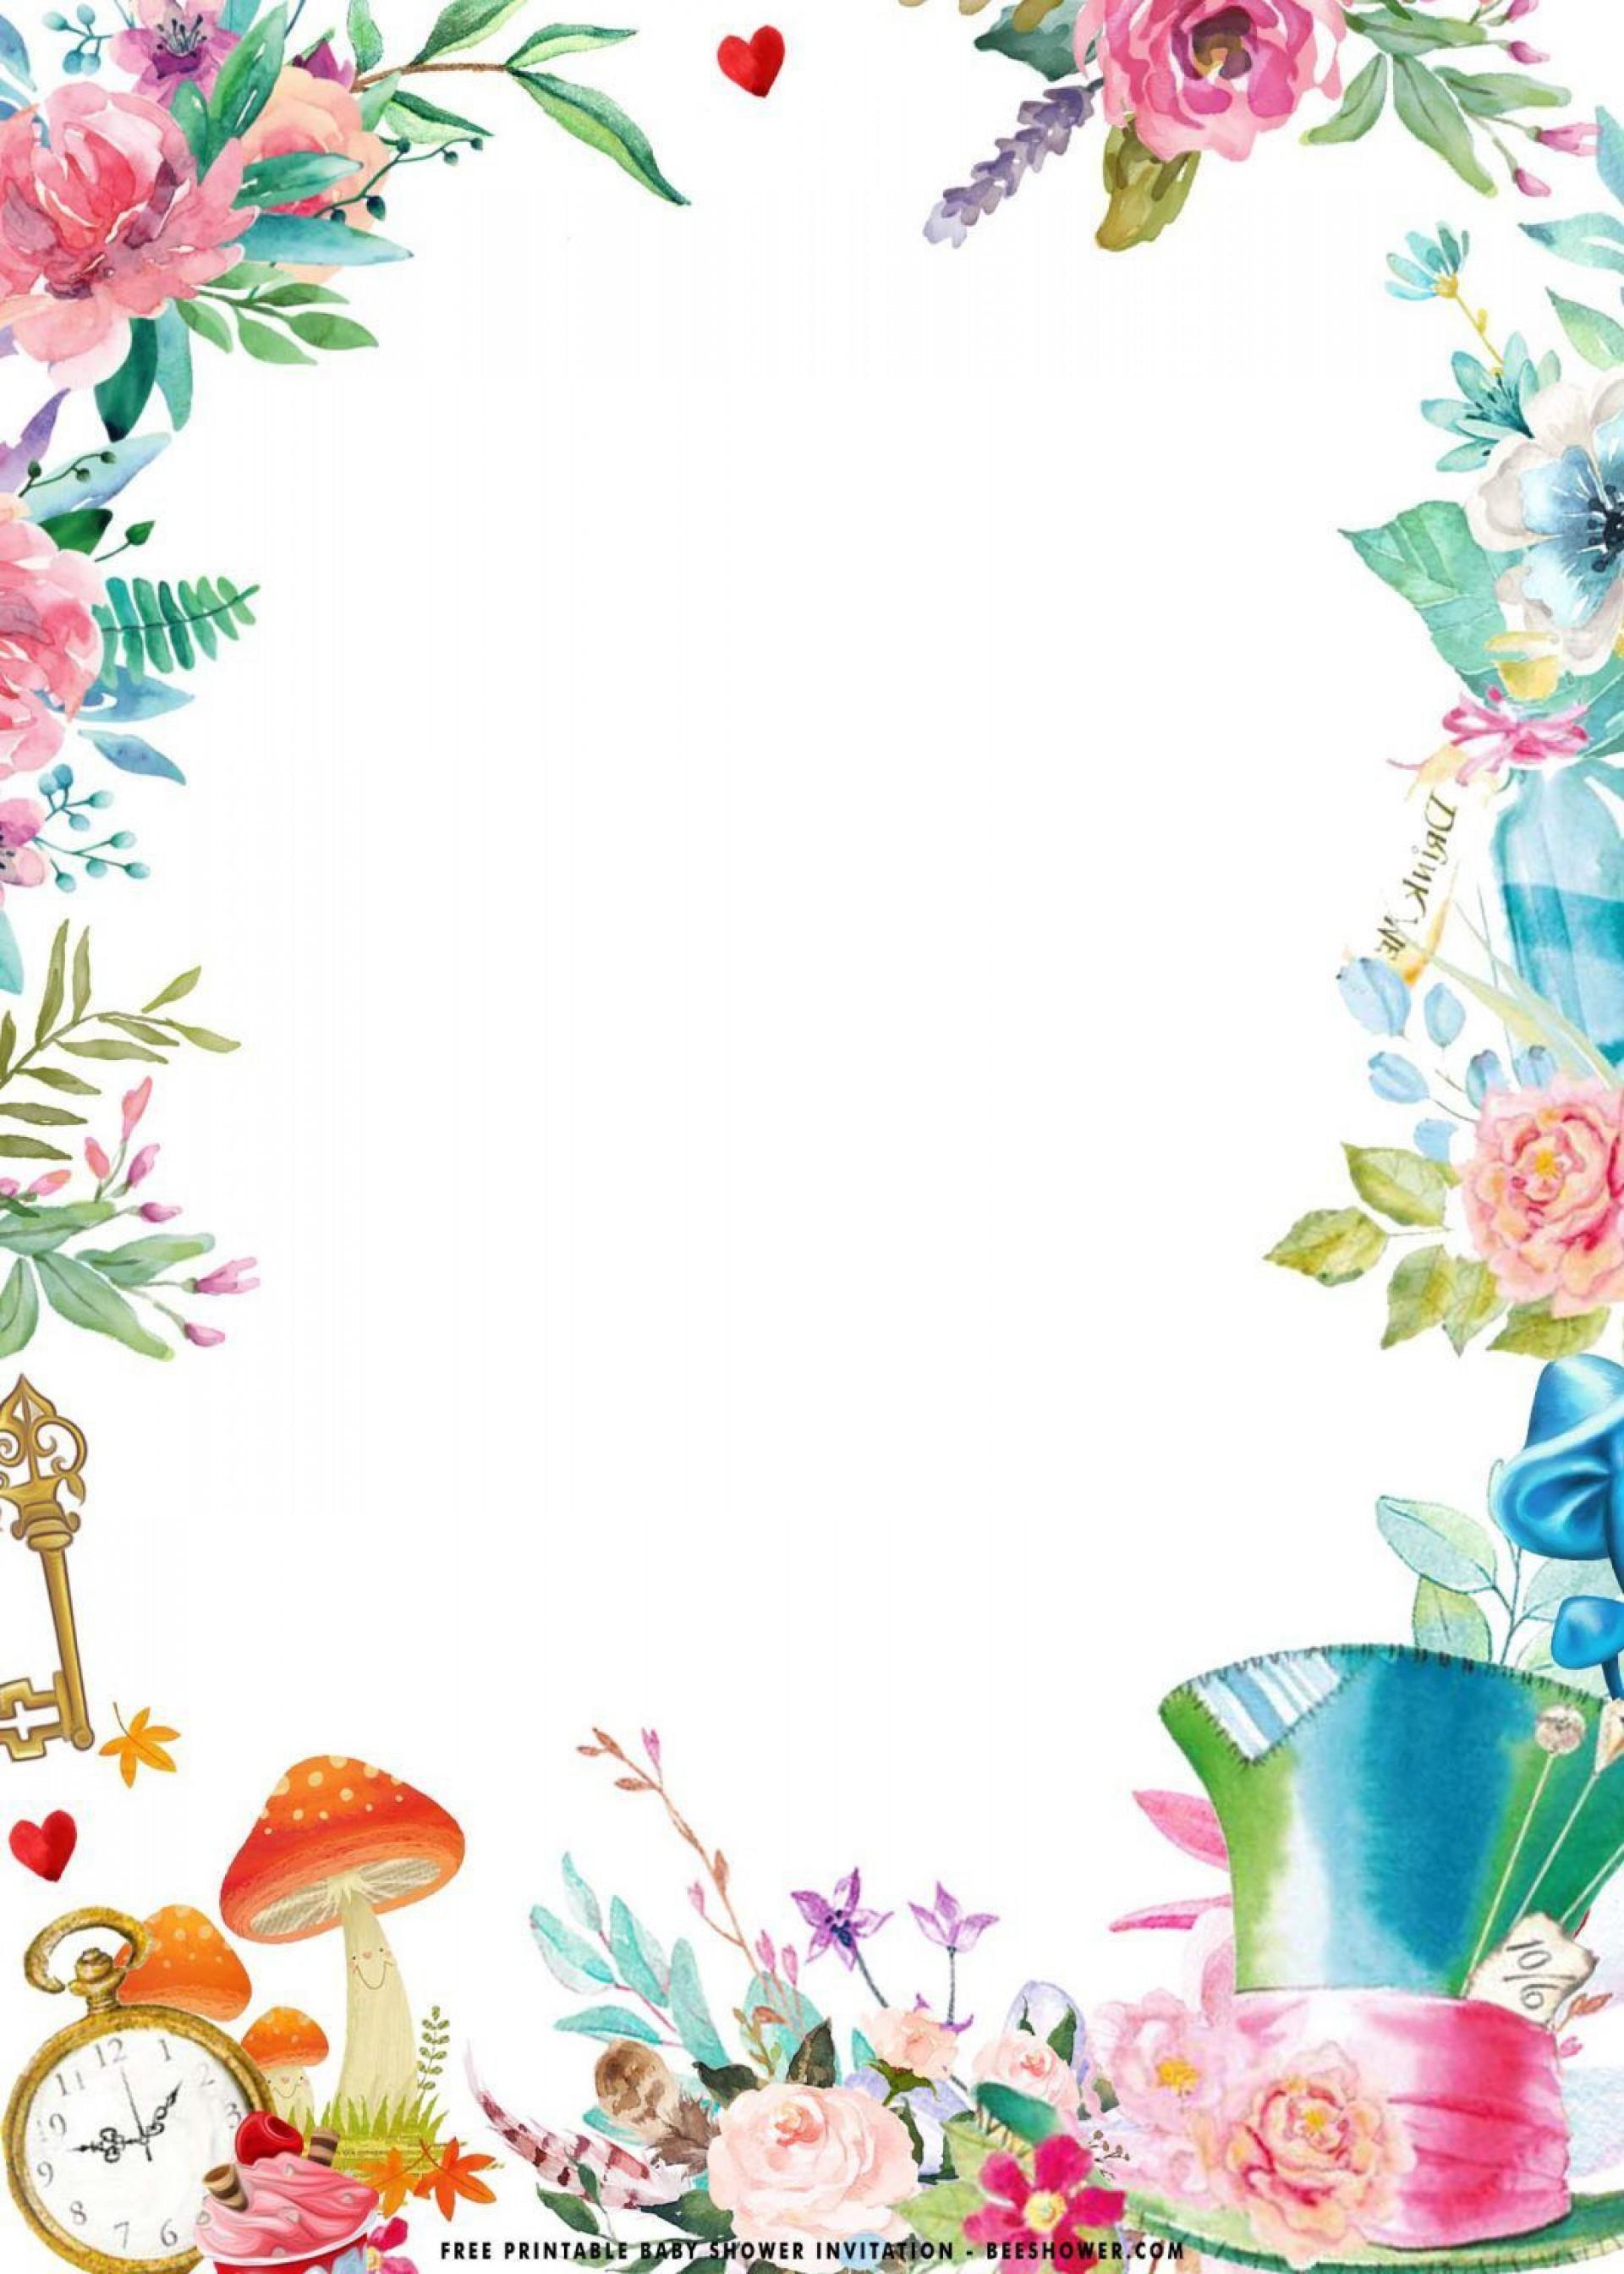 000 Best Alice In Wonderland Party Template Idea  Templates Invitation Free1920